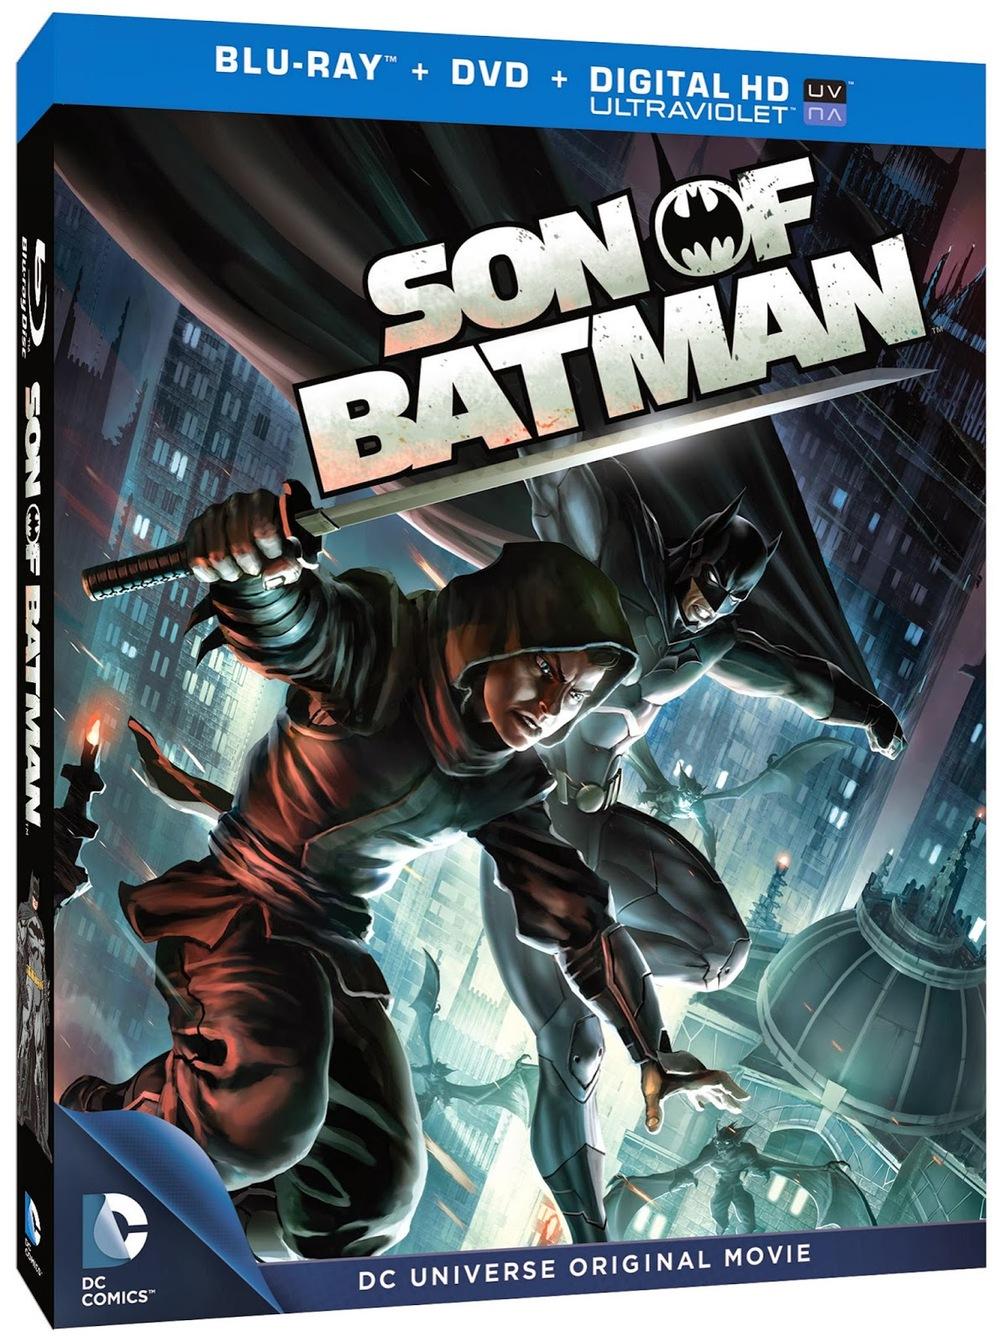 Son-of-Batman-Blu-ray-cover-art.jpg